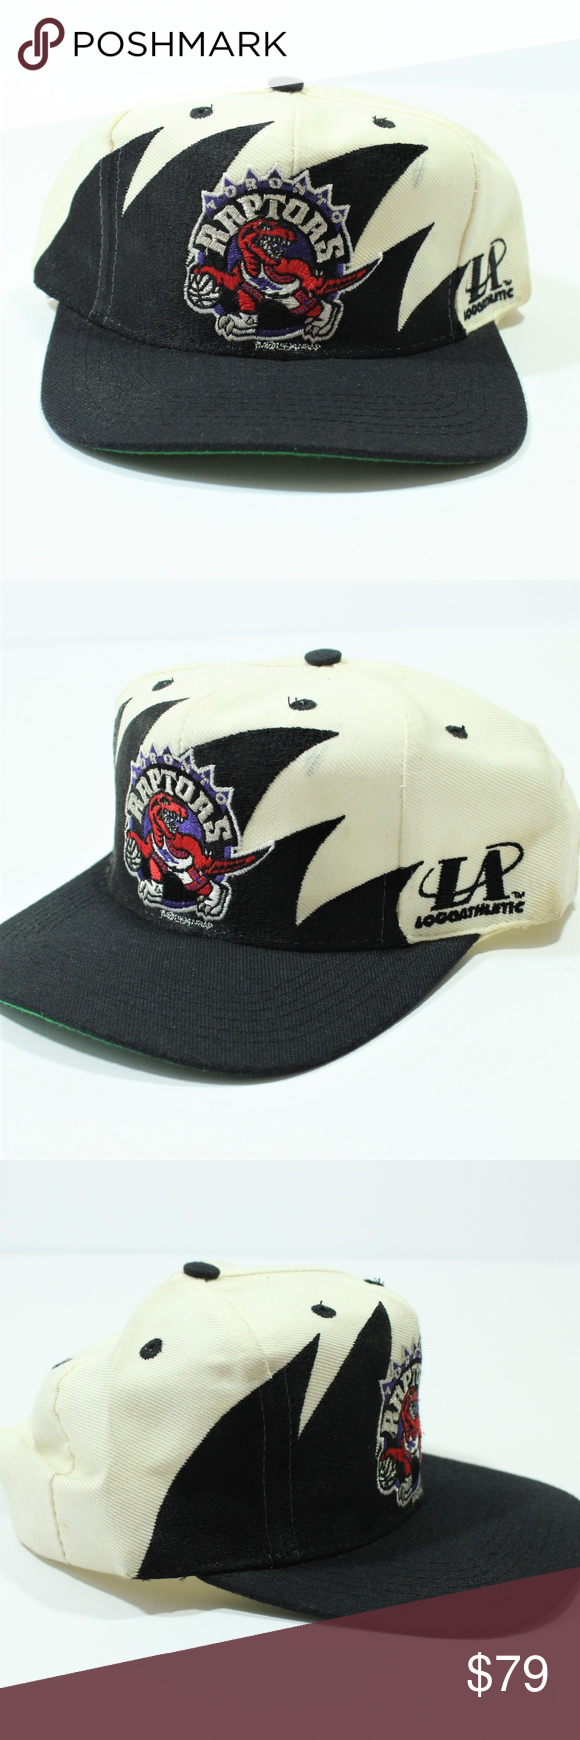 265e32ce VTG Logo Athletic SnapBack Toronto Raptors Hat Cap Vintage Logo Athletic  Shark Tooth SnapBack Hat NBA